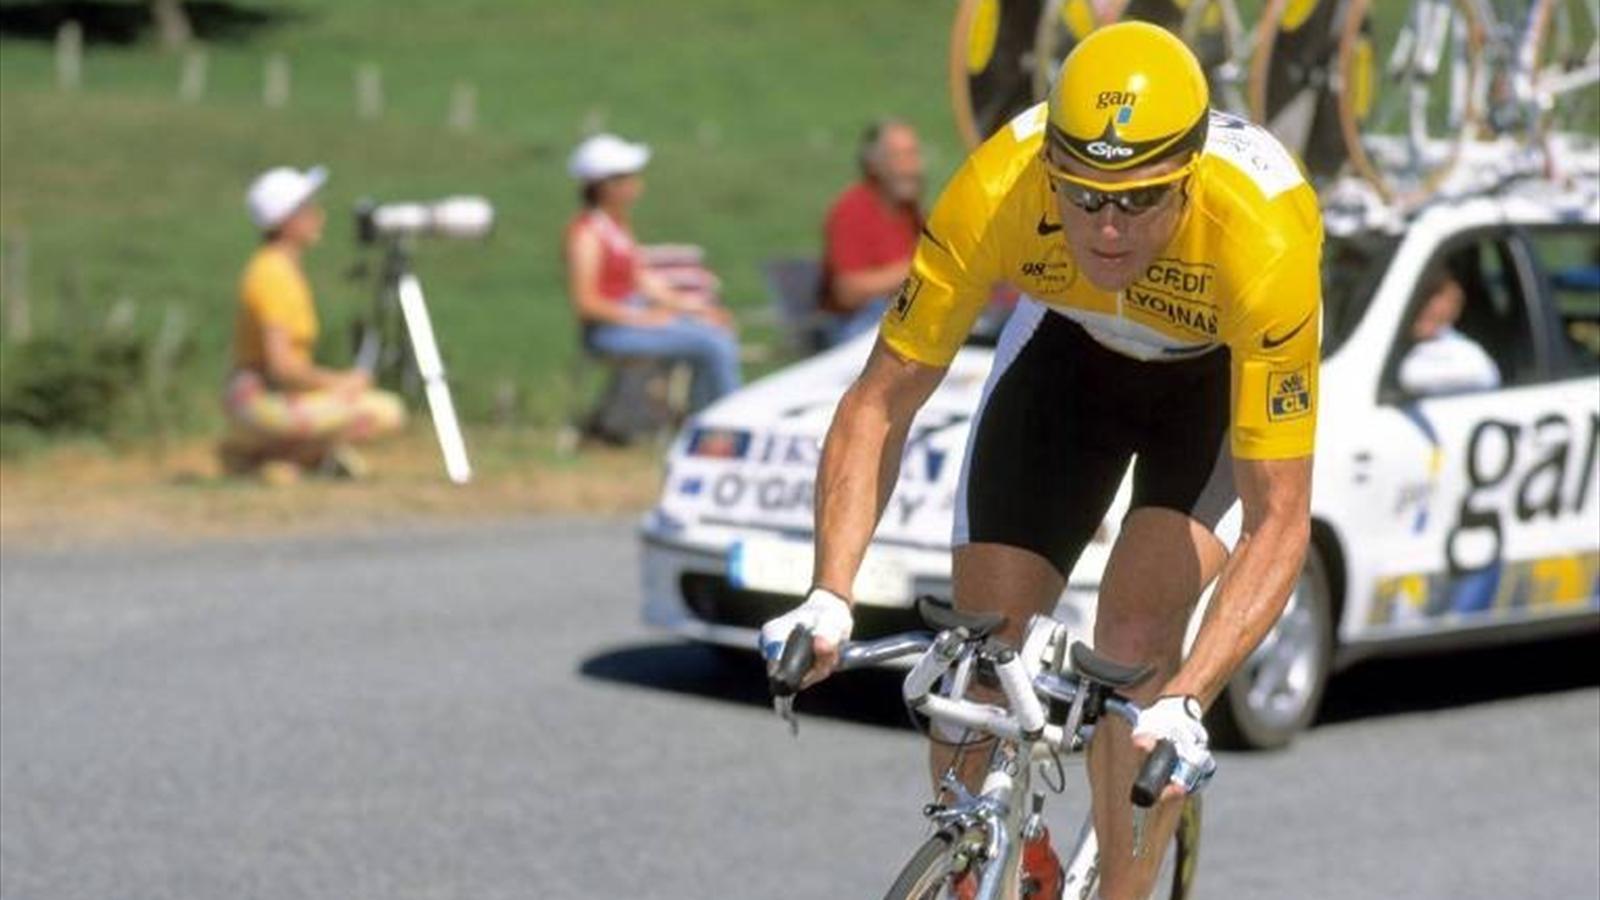 Just-retired O'Grady admits to using EPO in 1998 - Eurosport